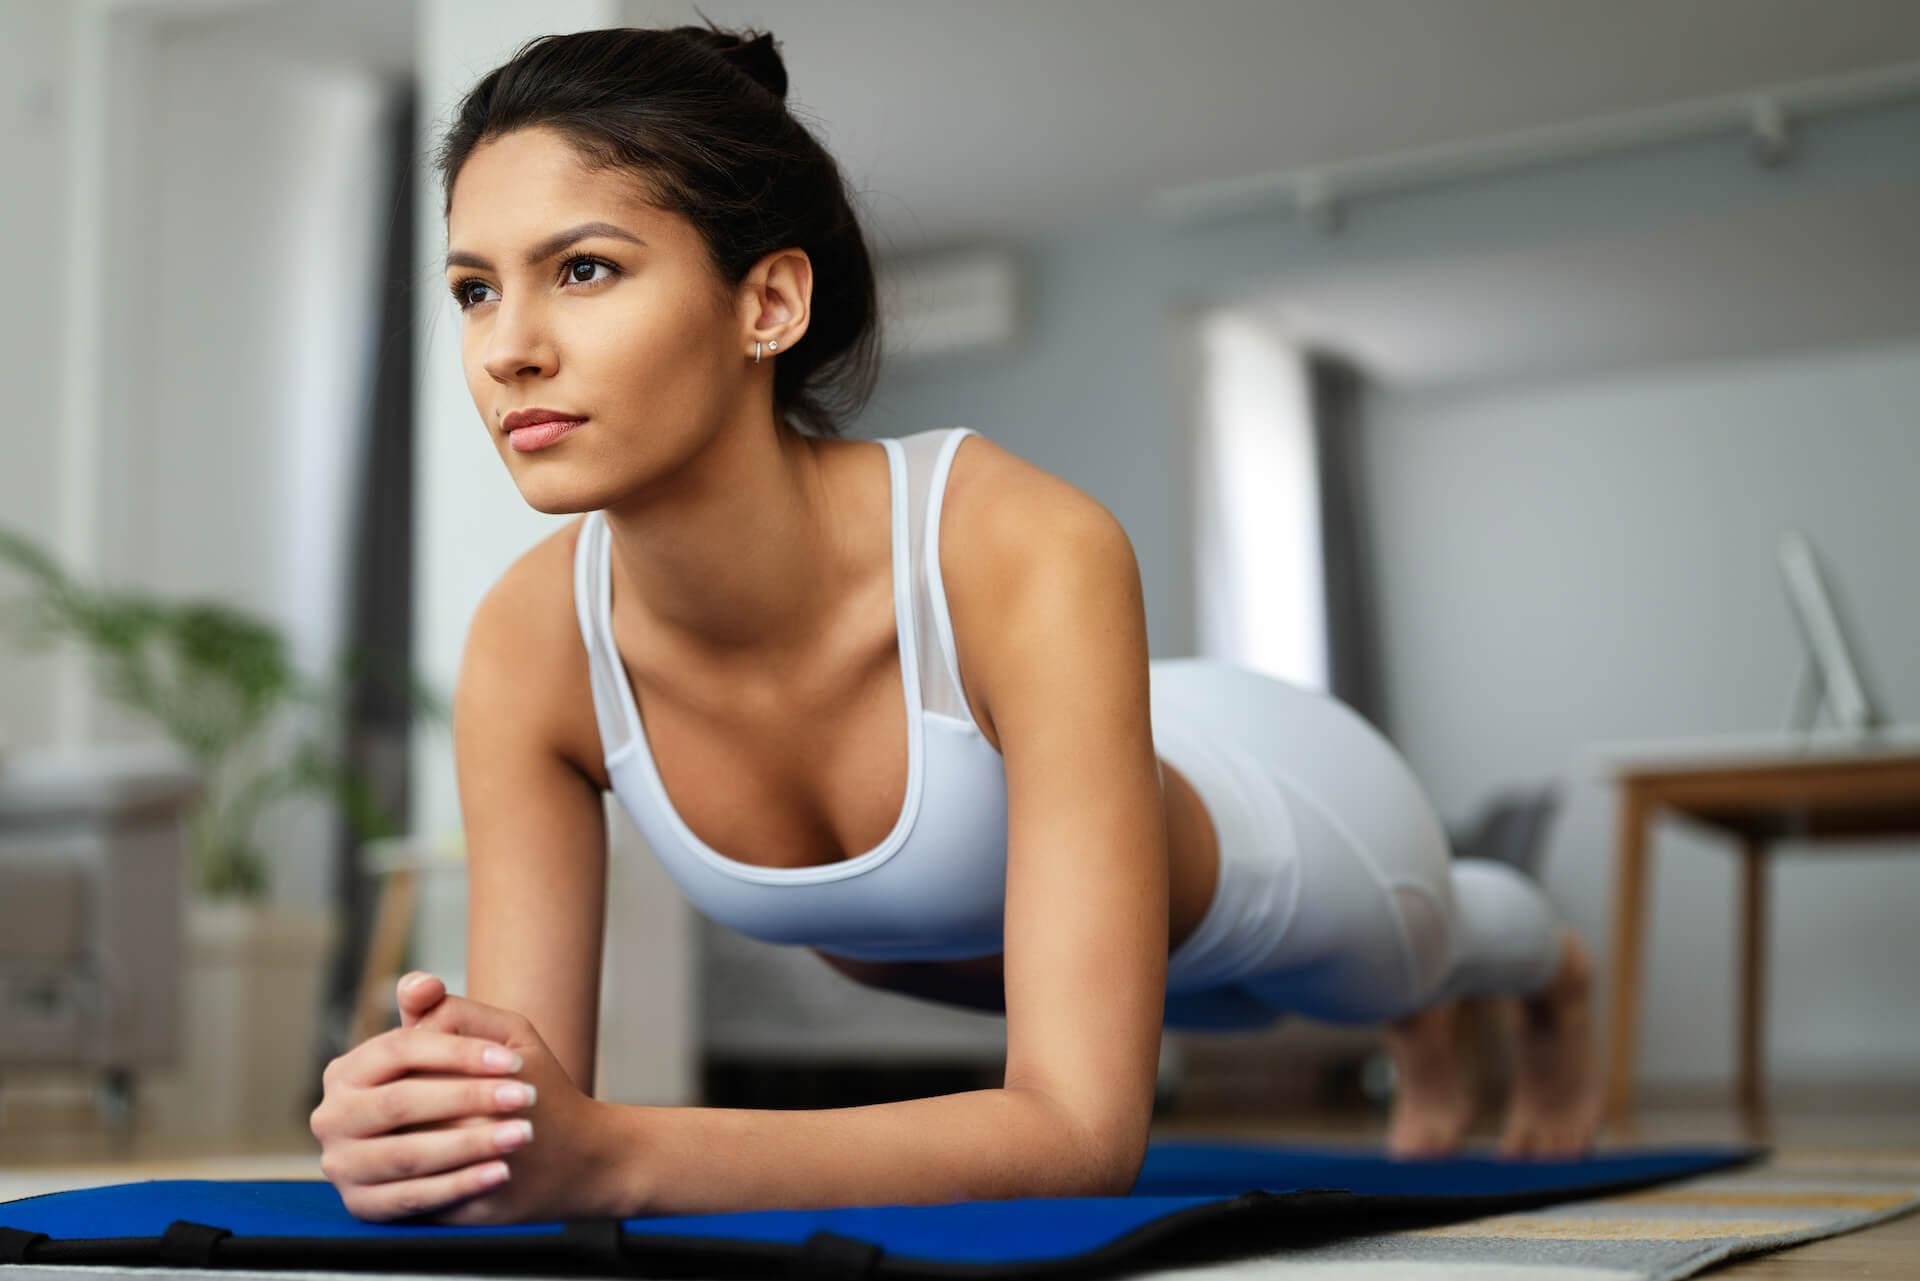 Atividade Física e Endometriose